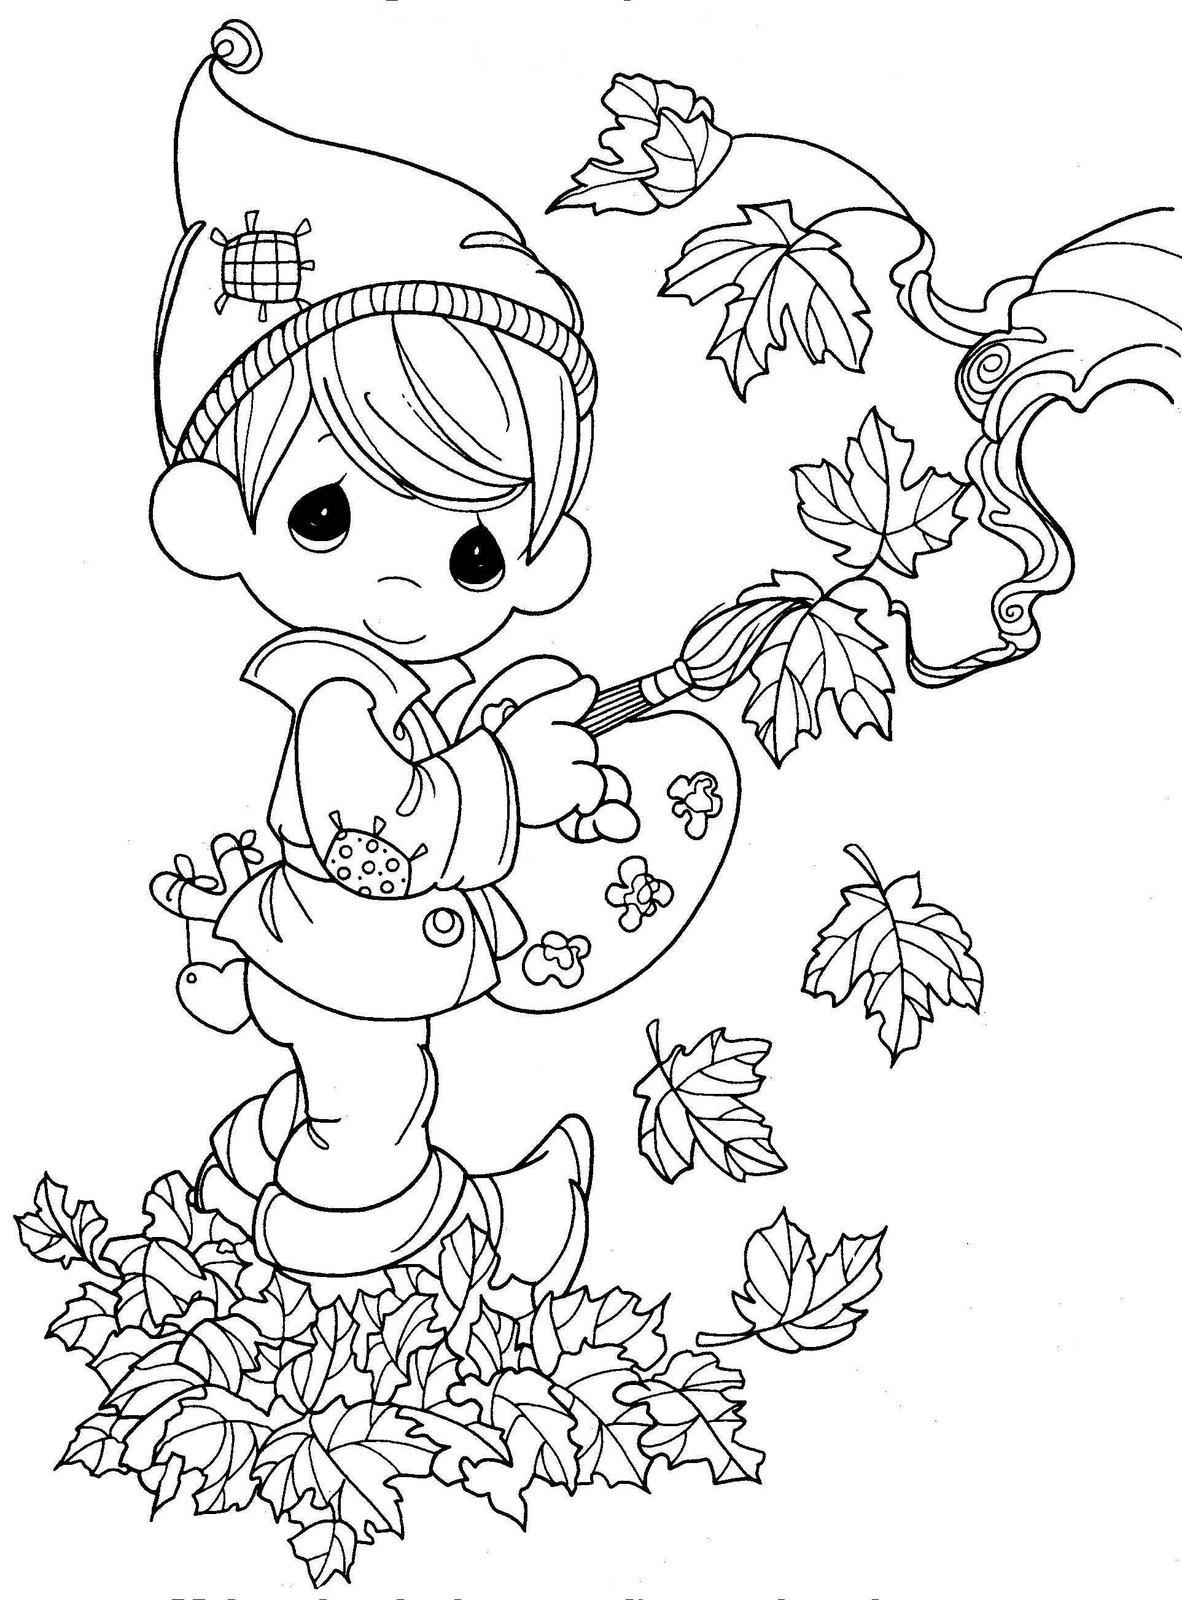 autumn season coloring pages autumn coloring pages pages coloring autumn season